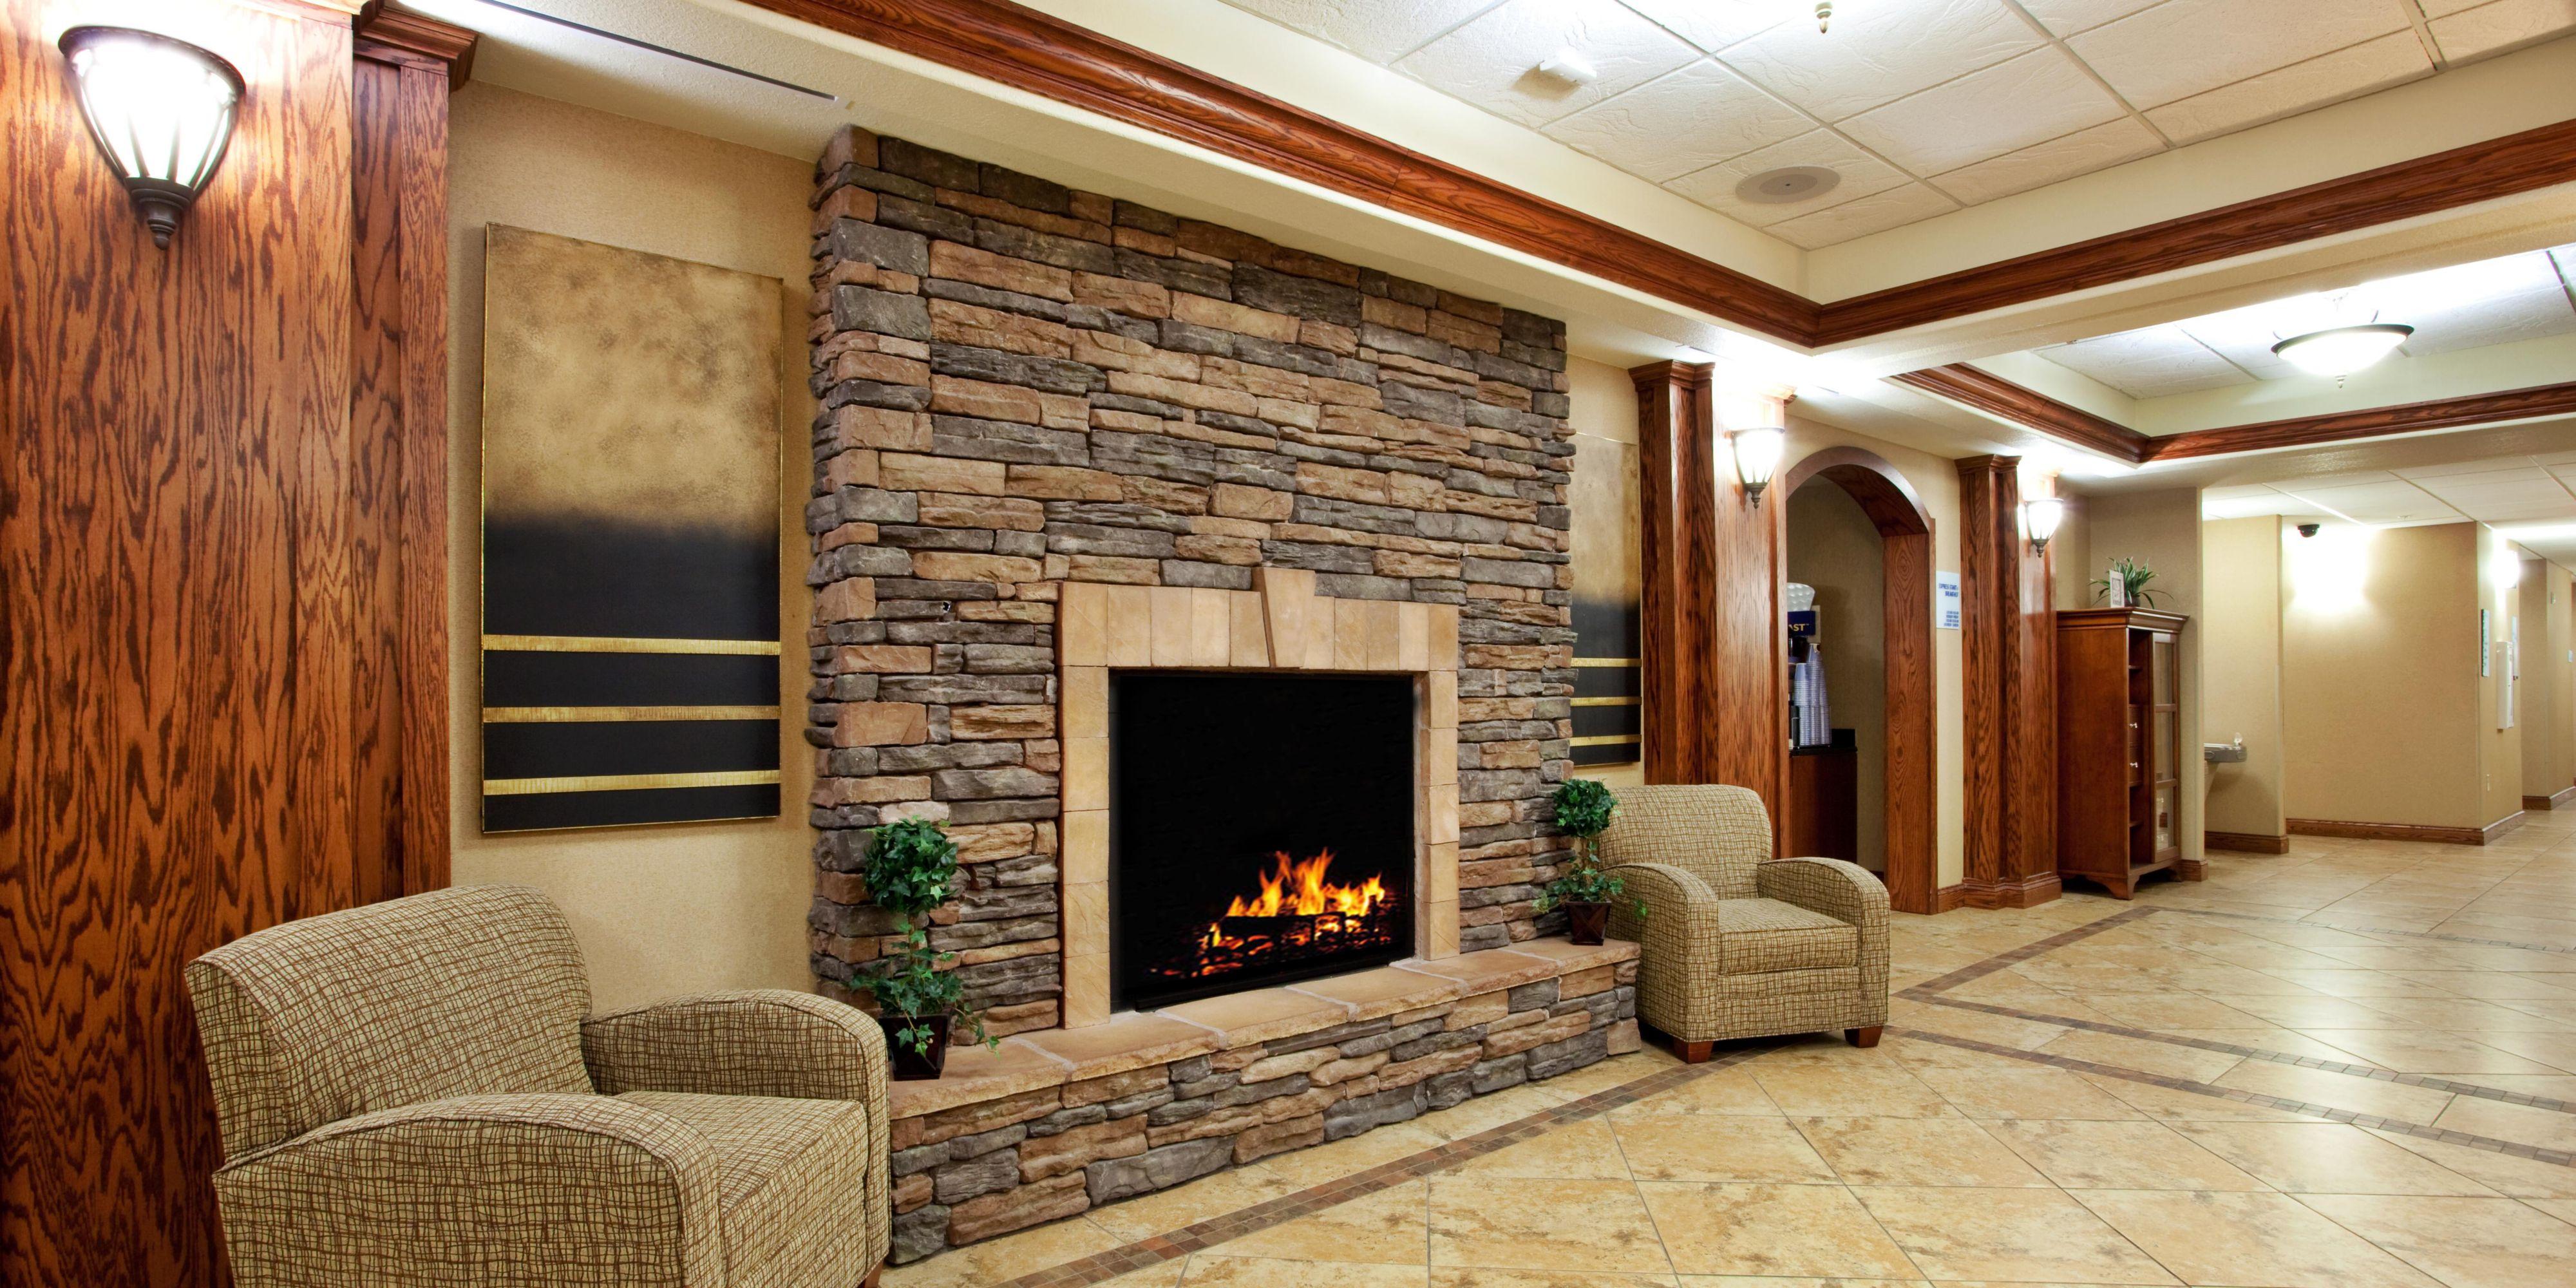 ... Holiday Inn Express U0026amp; Suites Lewisburg, WV Hotel Lobby ...